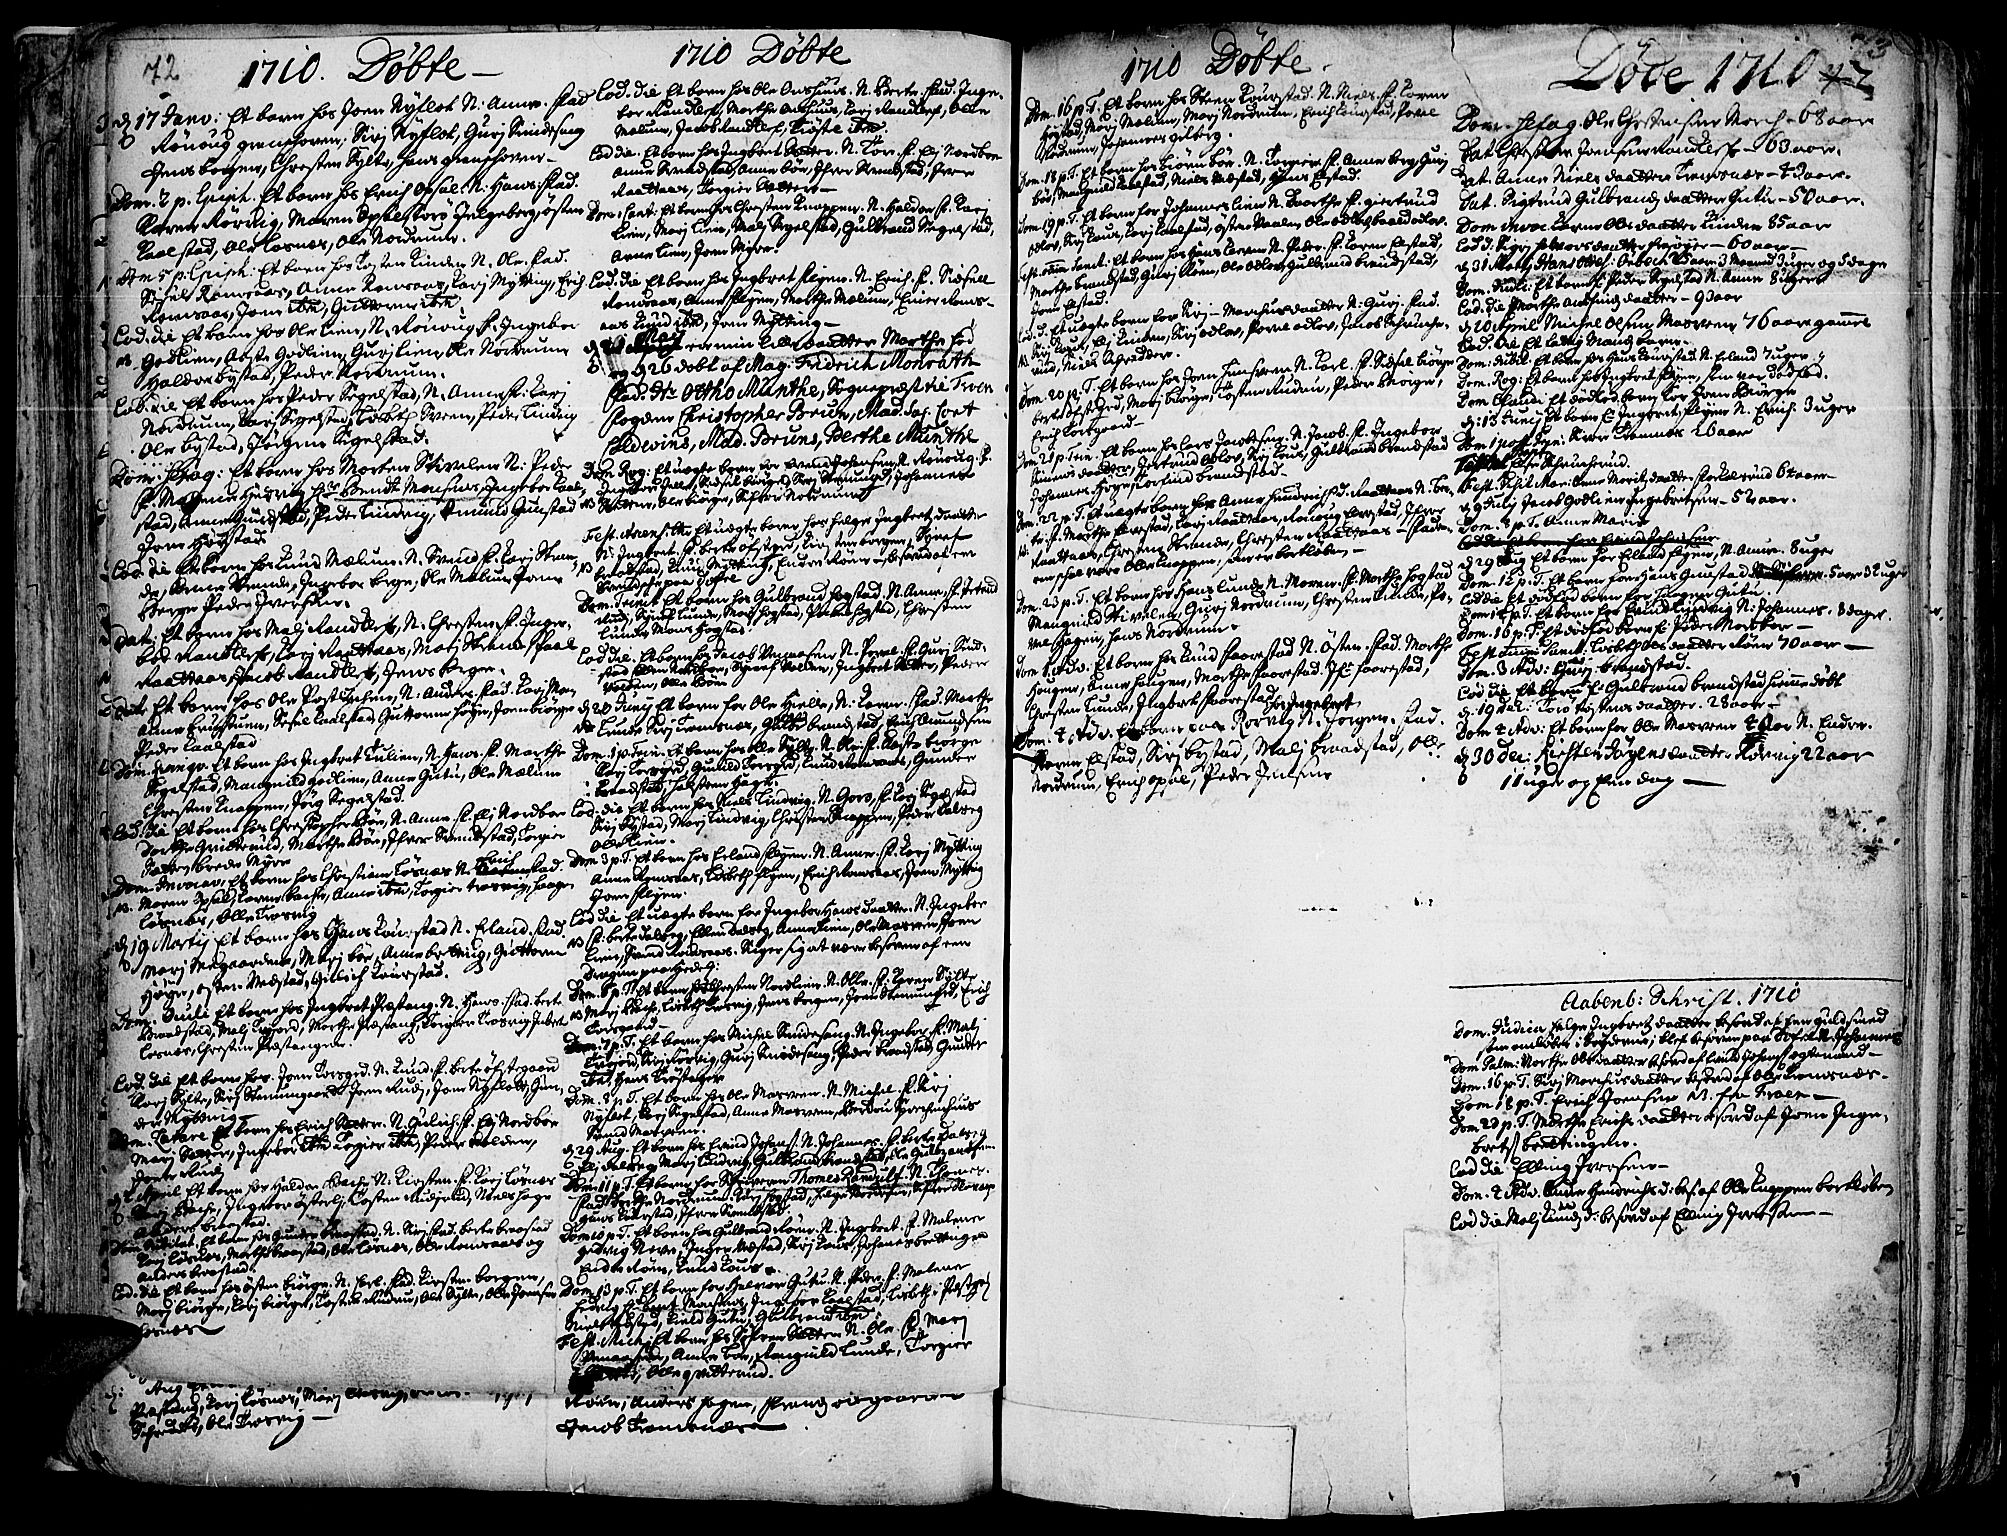 SAH, Ringebu prestekontor, Ministerialbok nr. 1, 1696-1733, s. 72-73